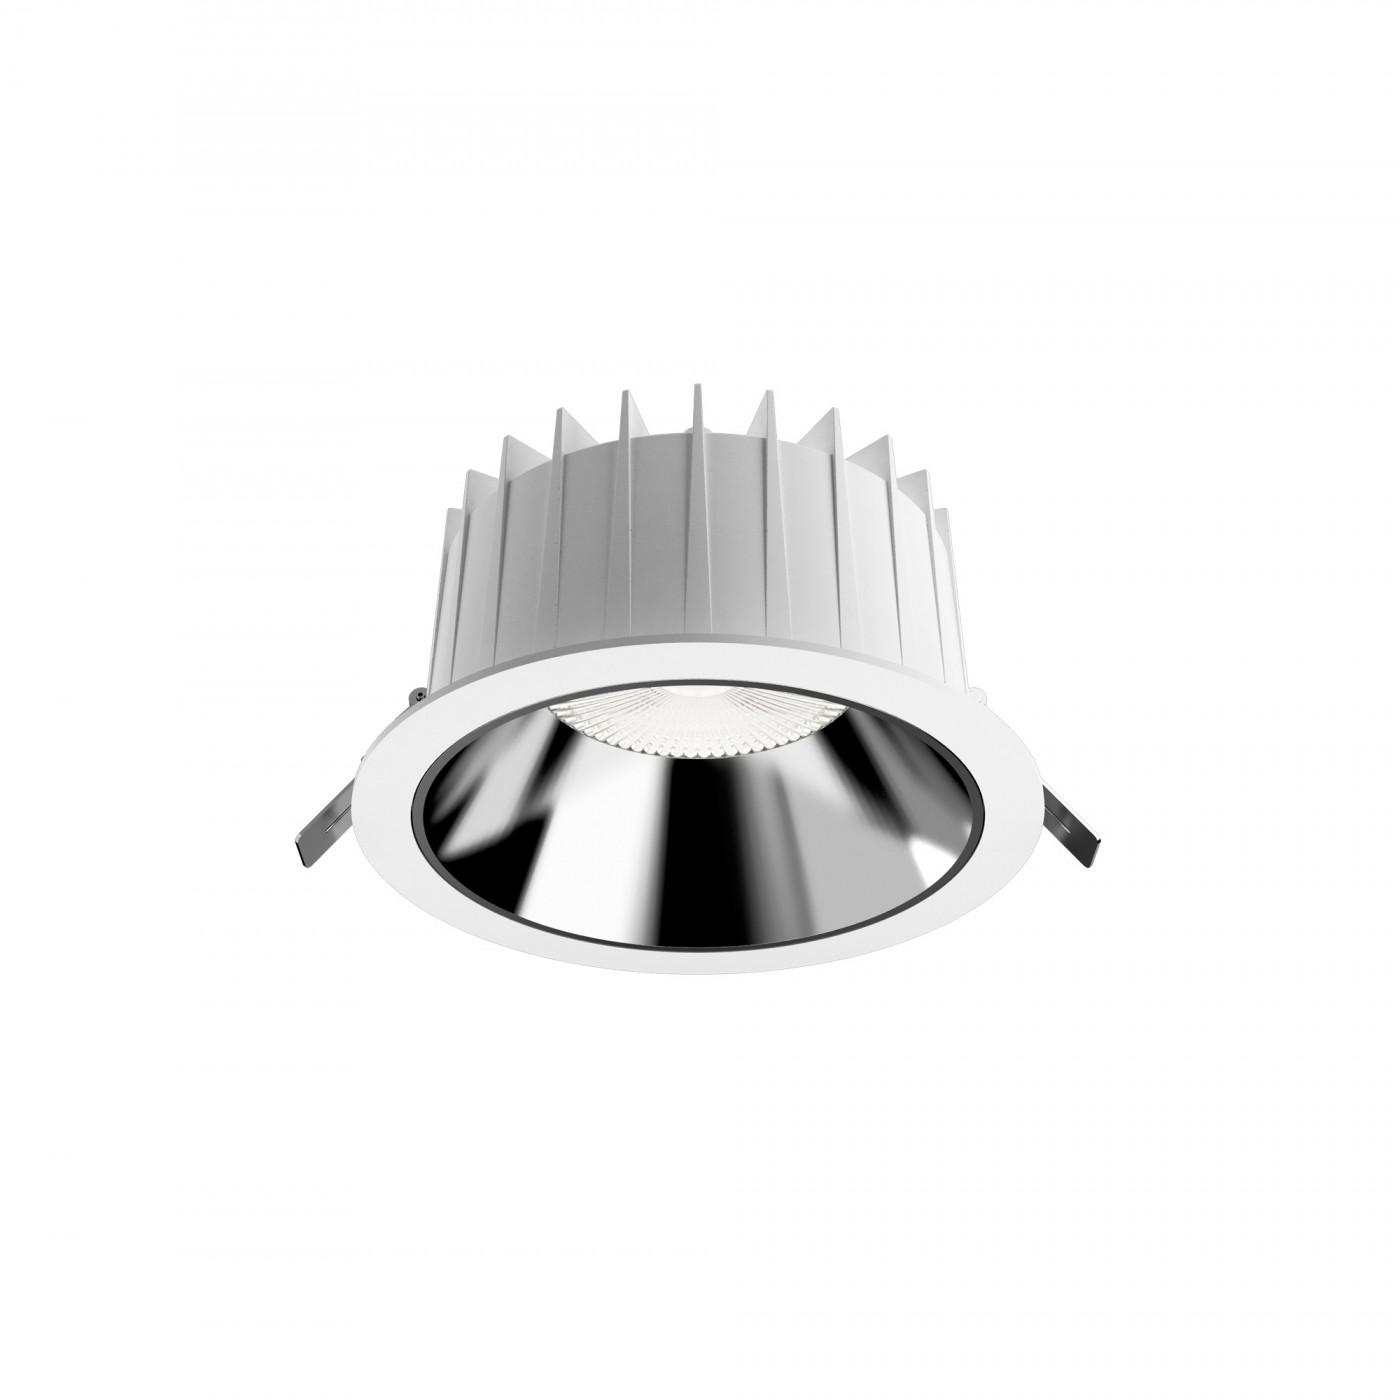 CL KEA LED 40W 4000K  8767 Nowodvorski Lighting